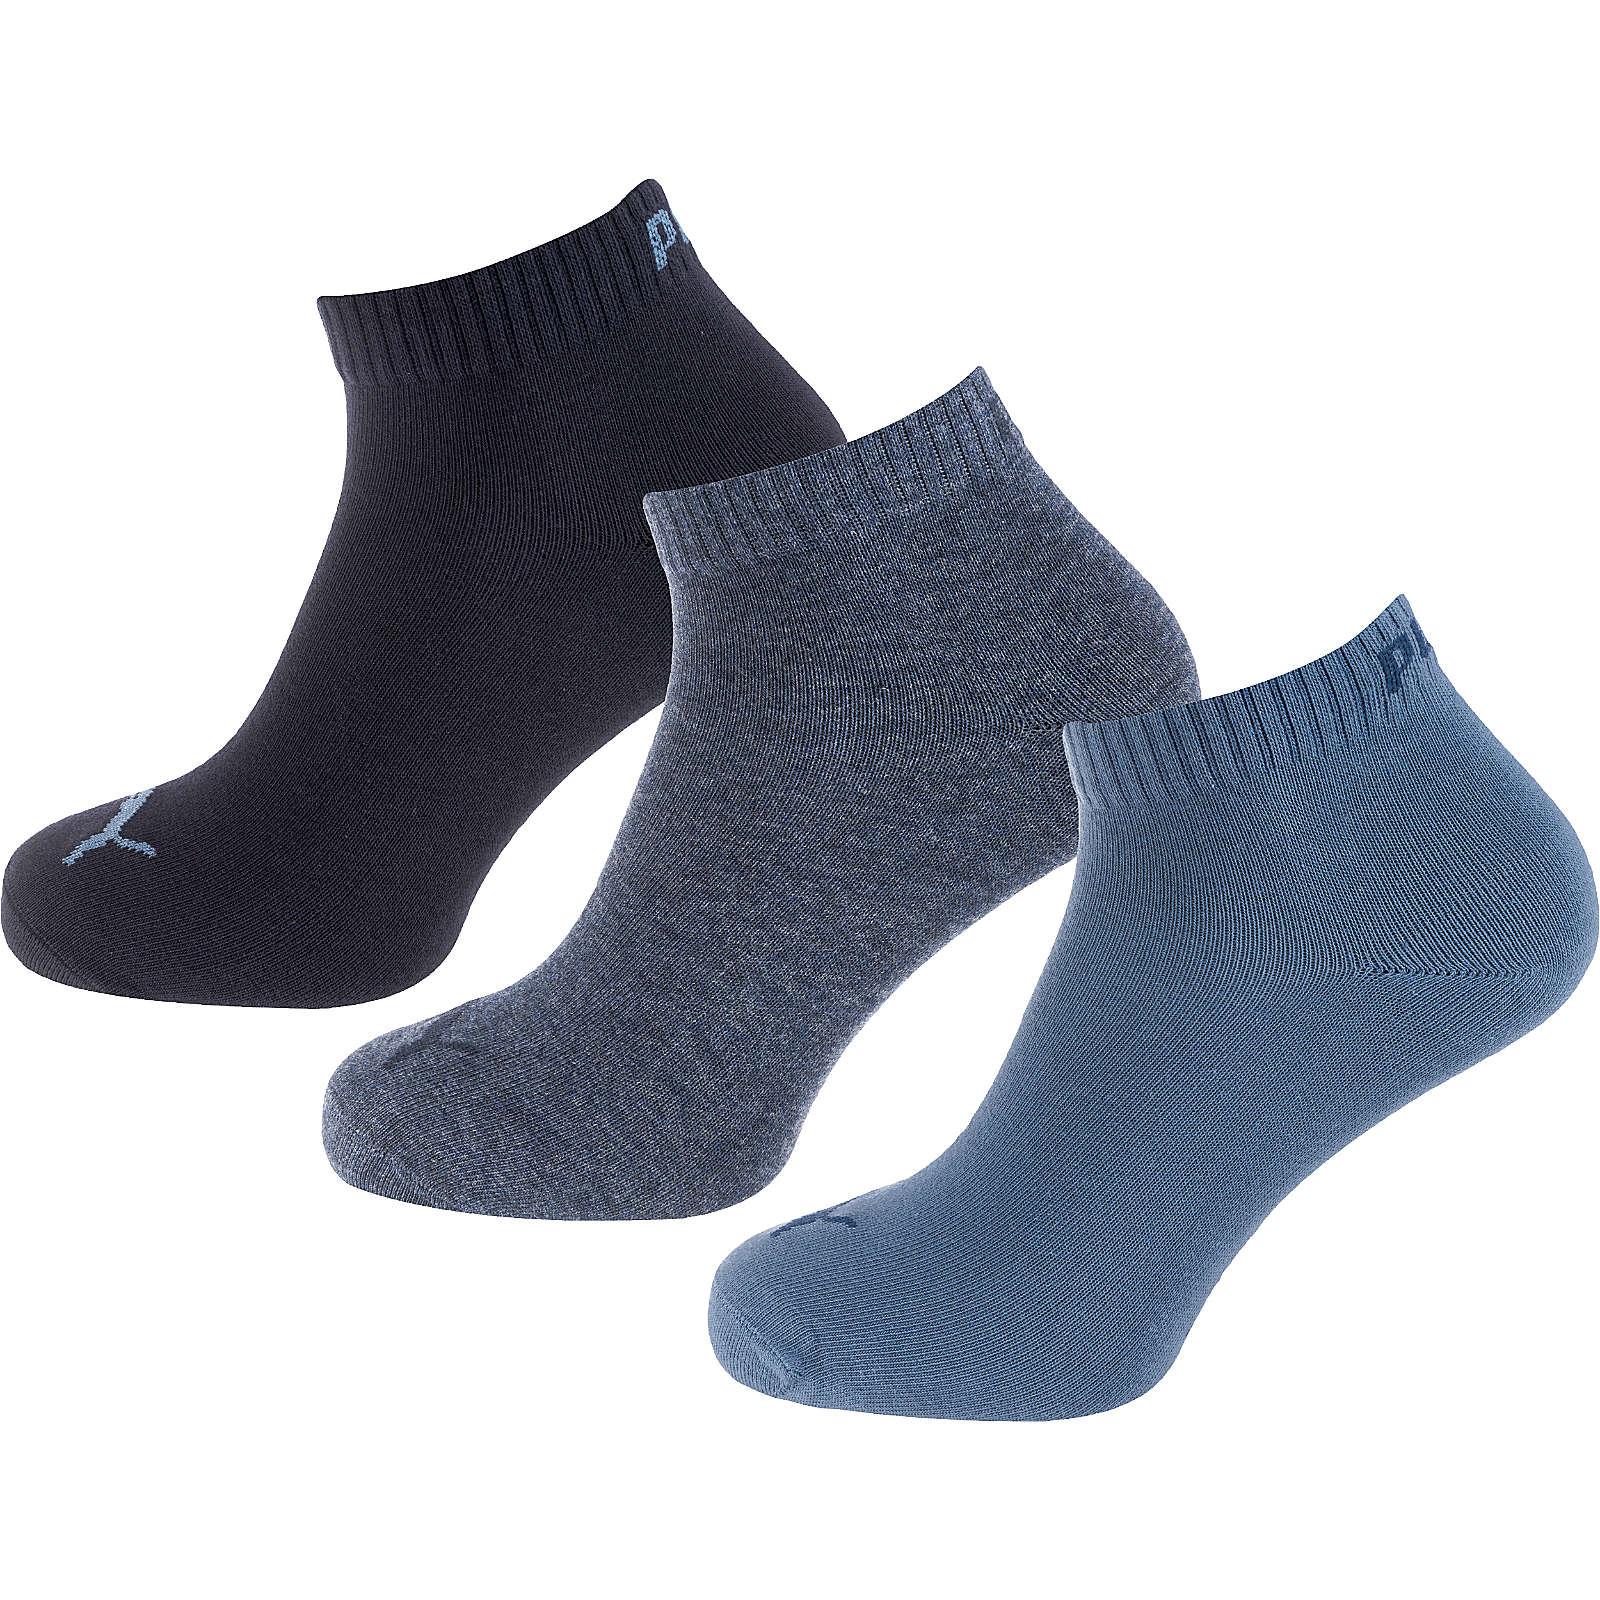 PUMA 3 Paar Kurzsocken Socken blau Gr. 39-42